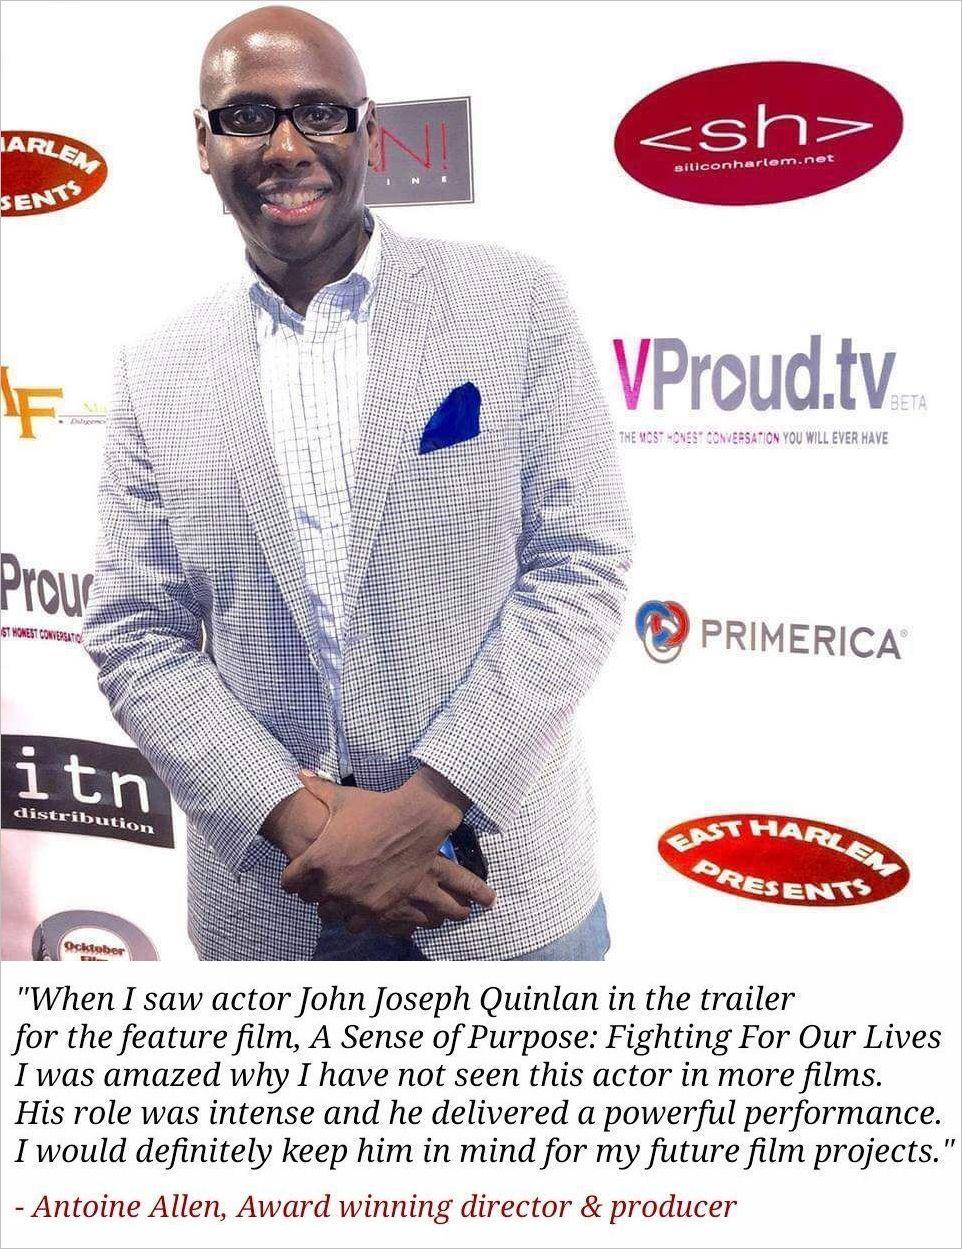 Director & Producer Antoine Allen Testimonial on Actor John Quinlan #JohnQuinlan